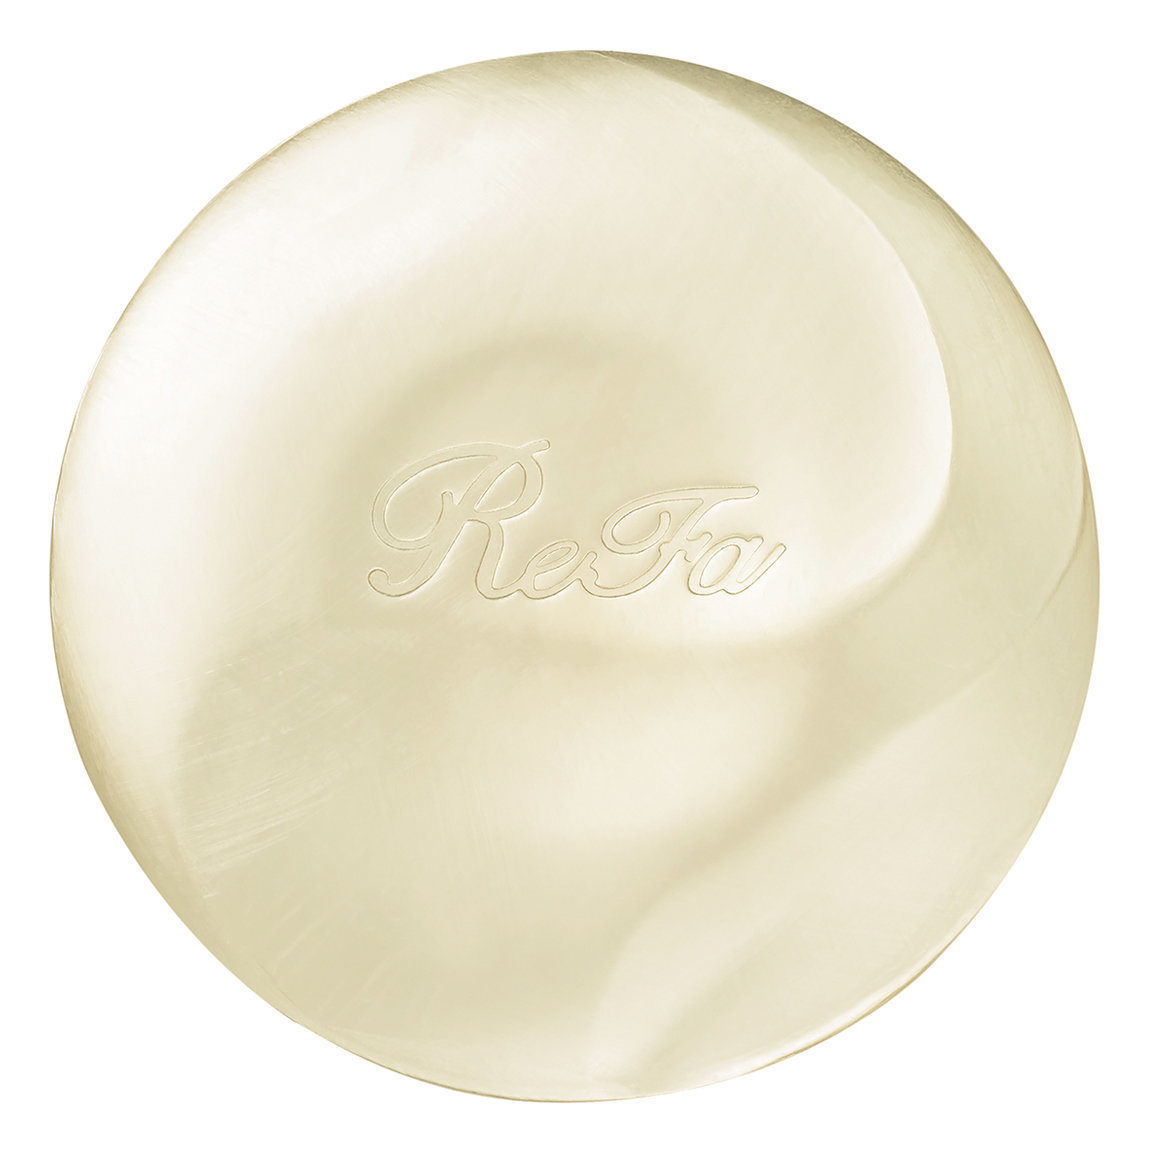 ReFa ReFa EXPRESSION ENRICH SOAP alternative view 1 - product swatch.